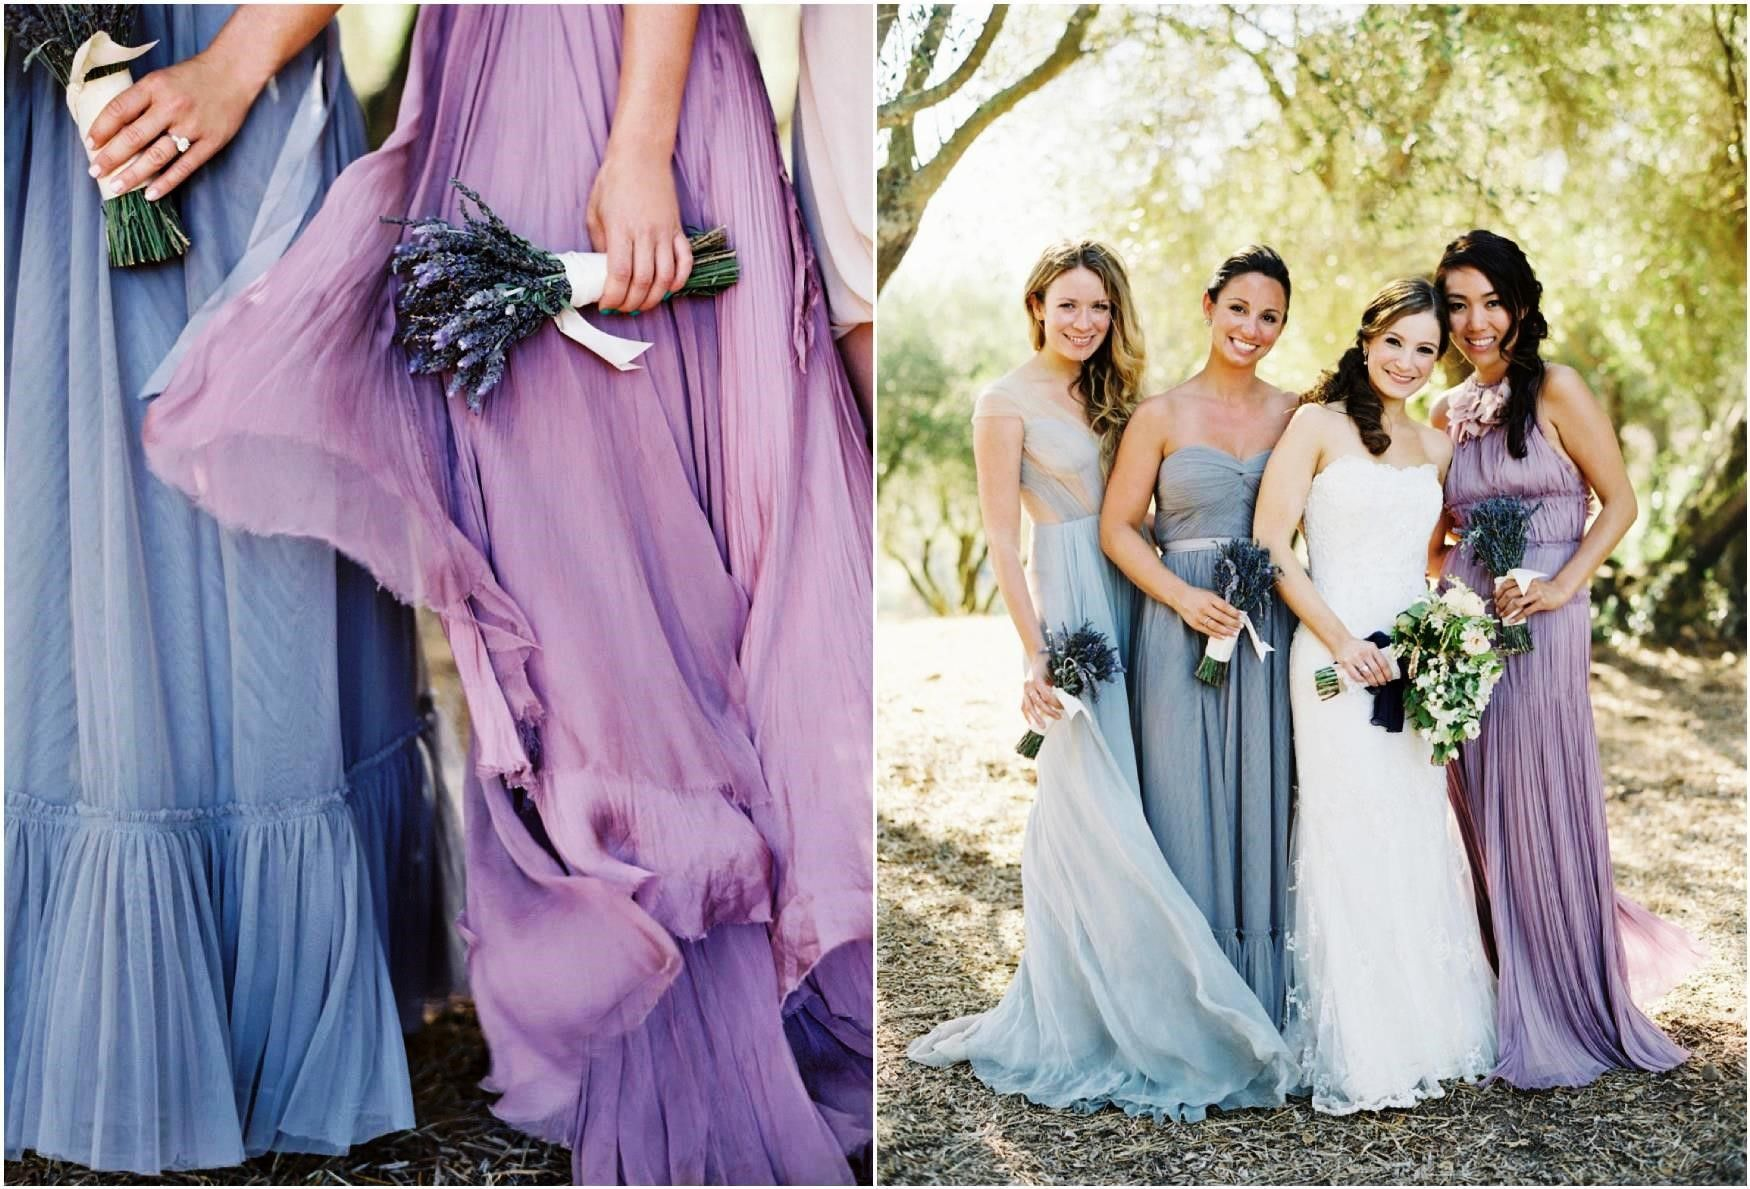 dresses with chic sashcherry light sash short bridesmaid purple strapless marry dress